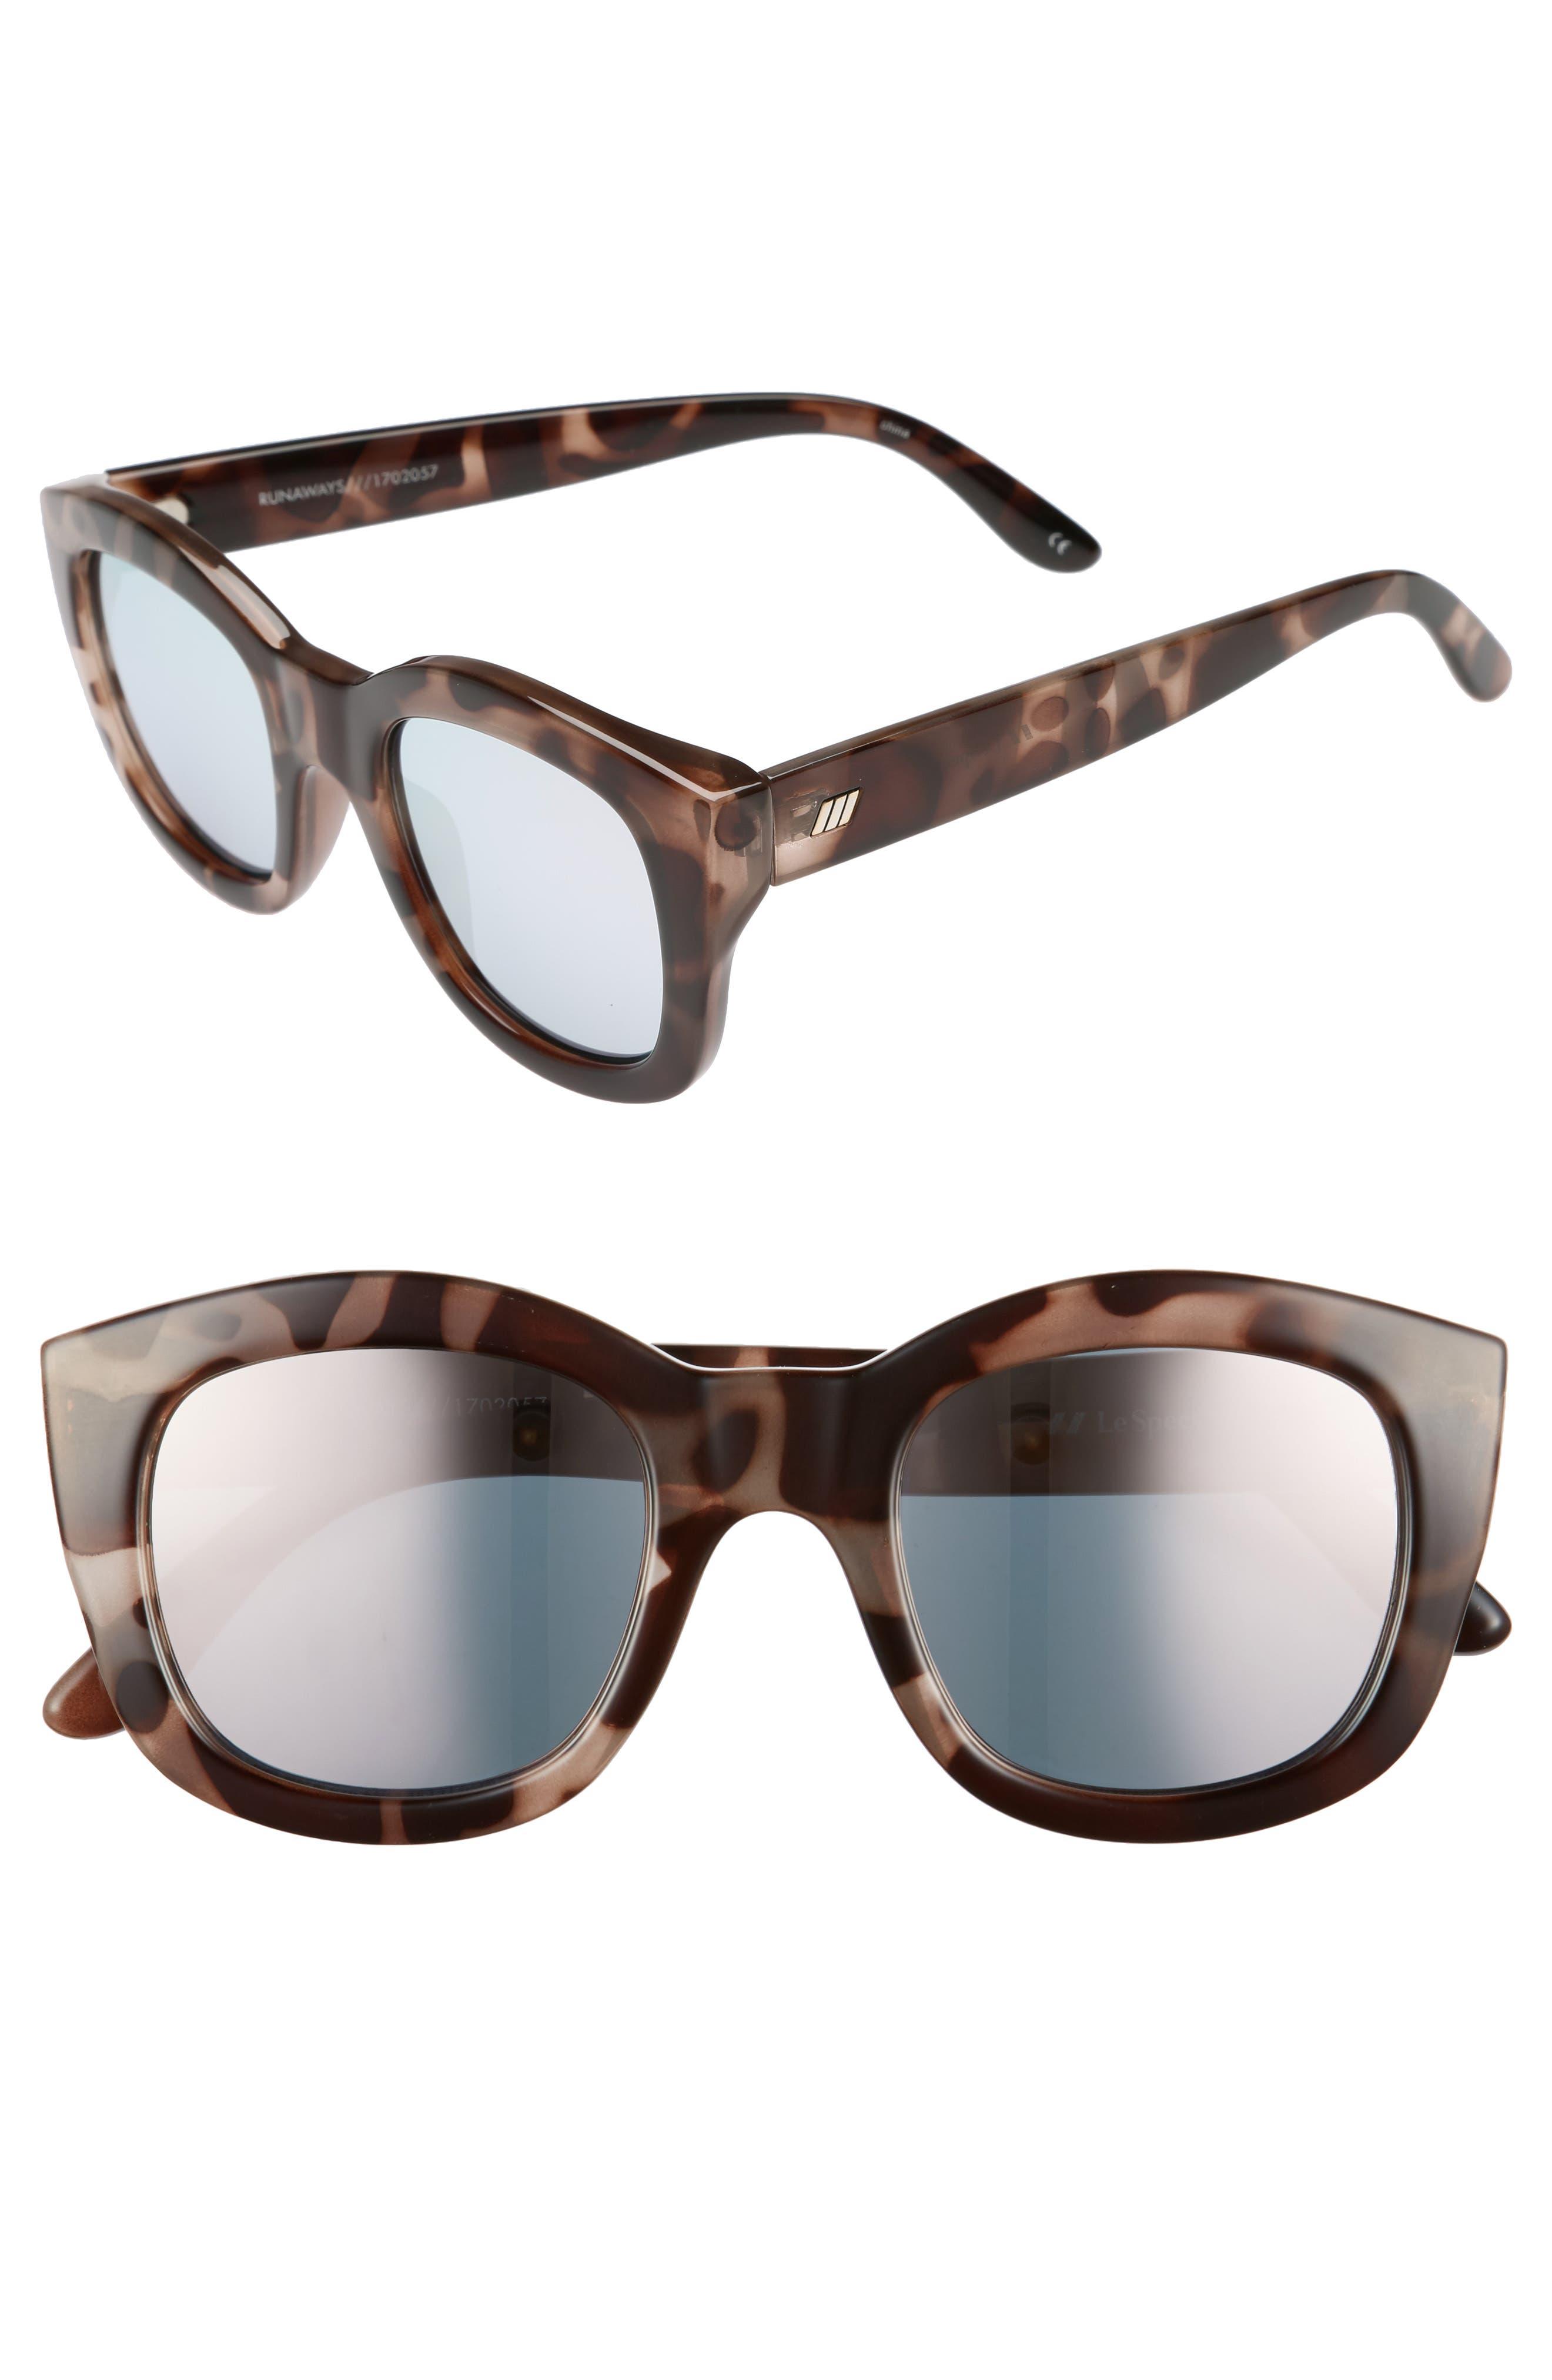 Runaways 48mm Rectangular Sunglasses,                             Main thumbnail 1, color,                             200